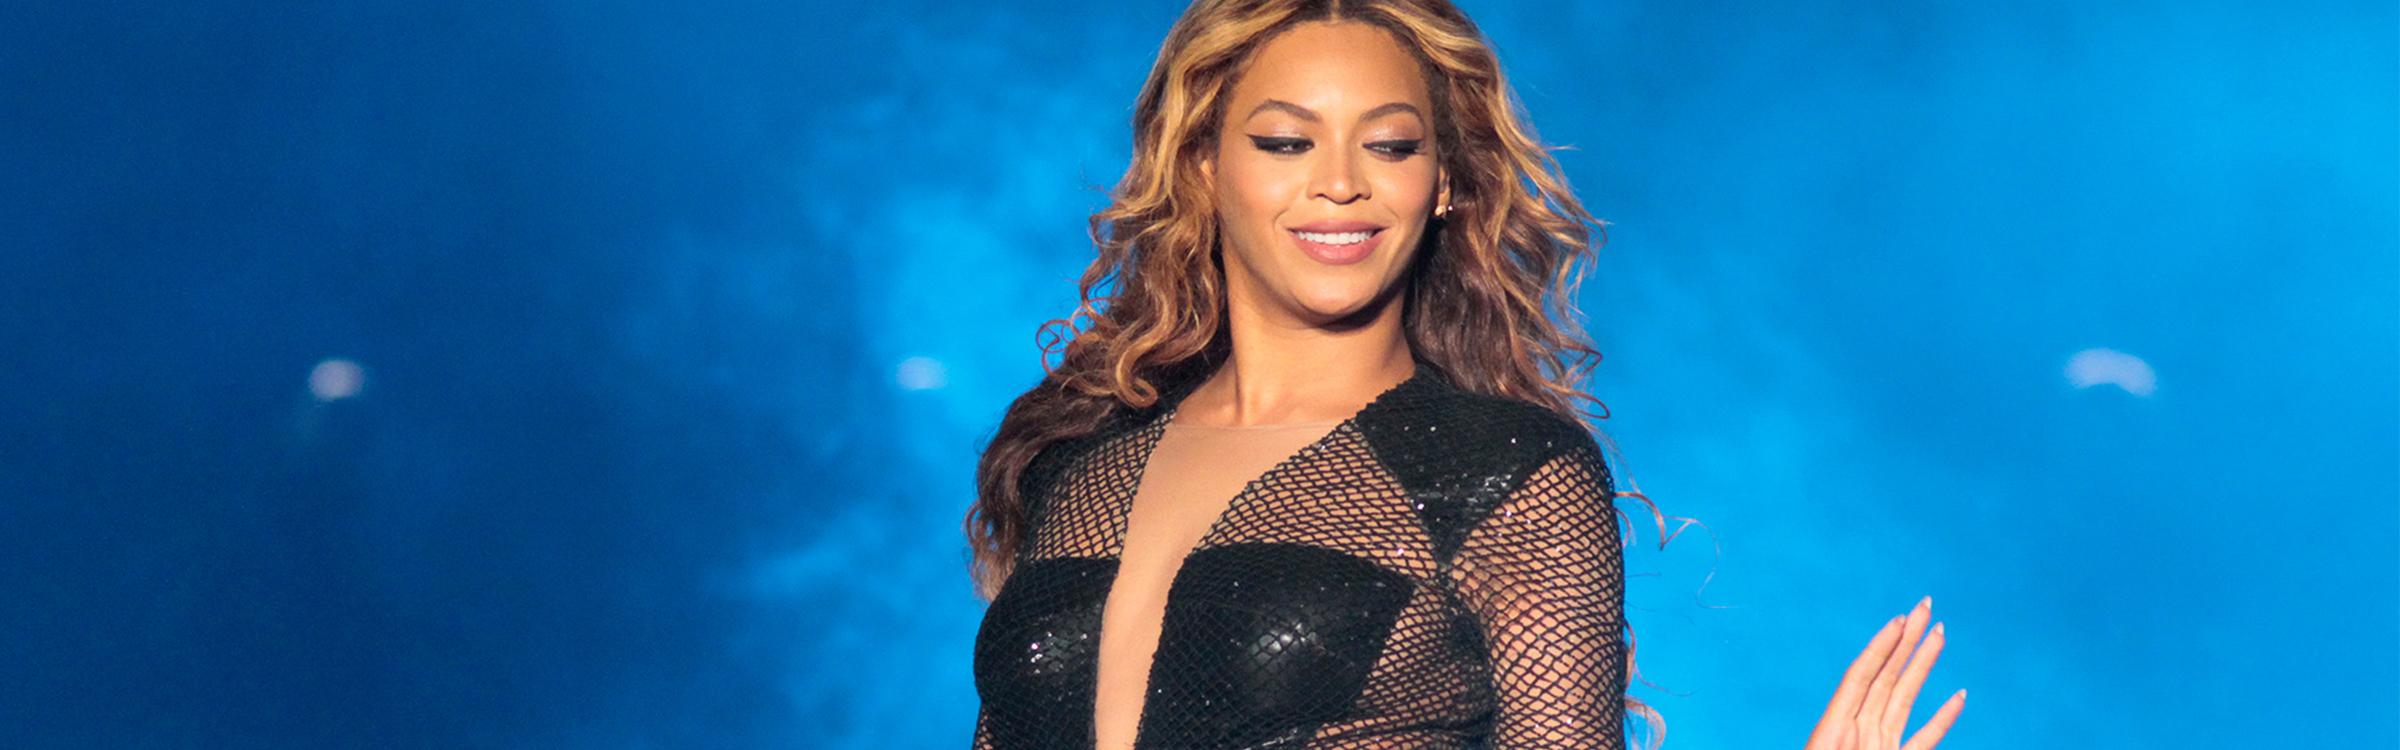 Beyonceheader2